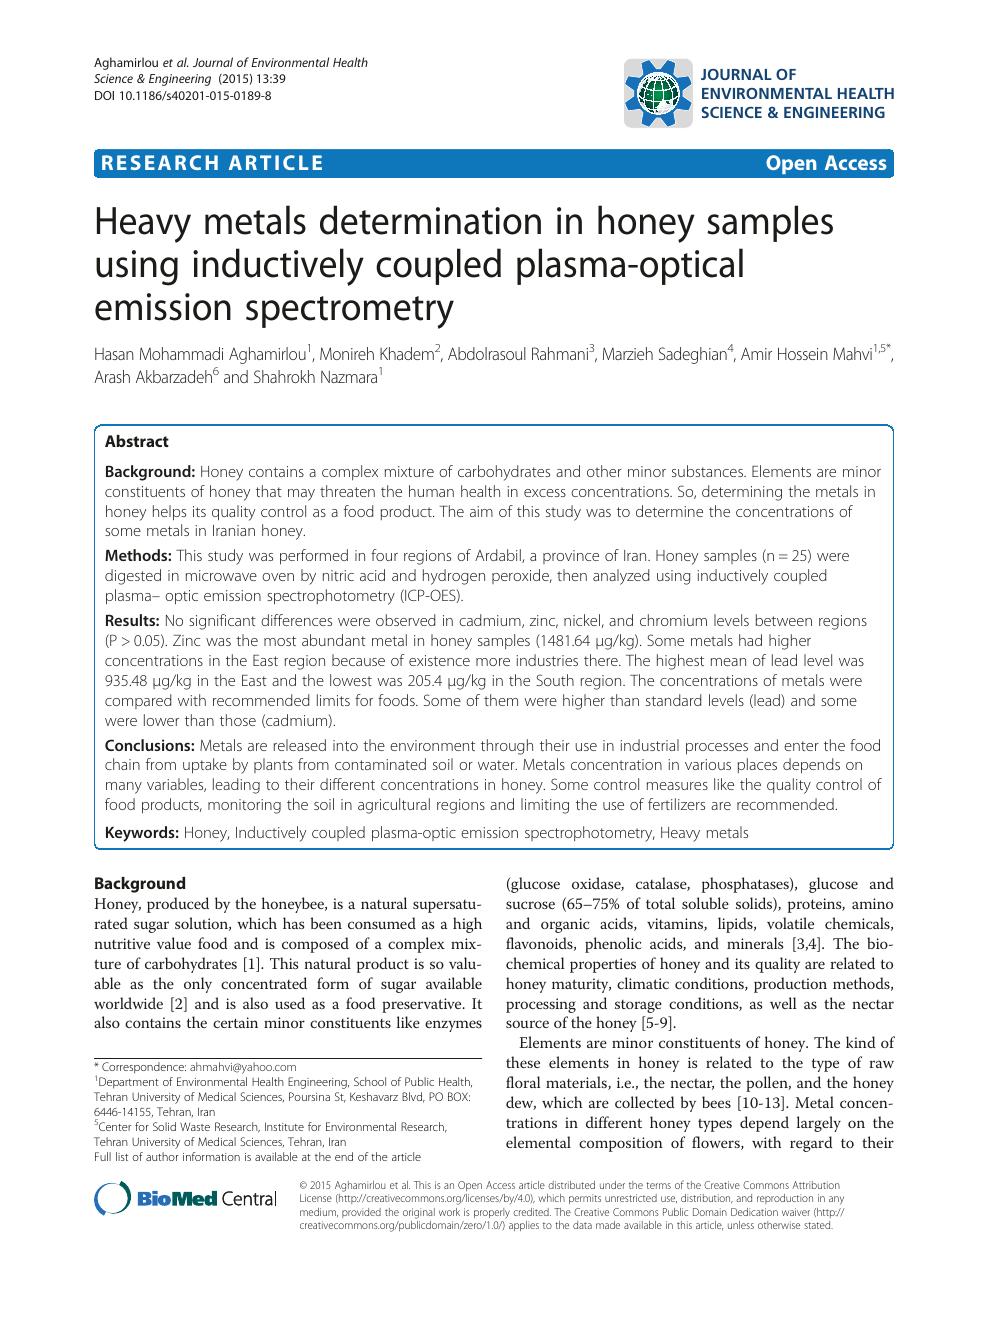 Heavy metals determination in honey samples using